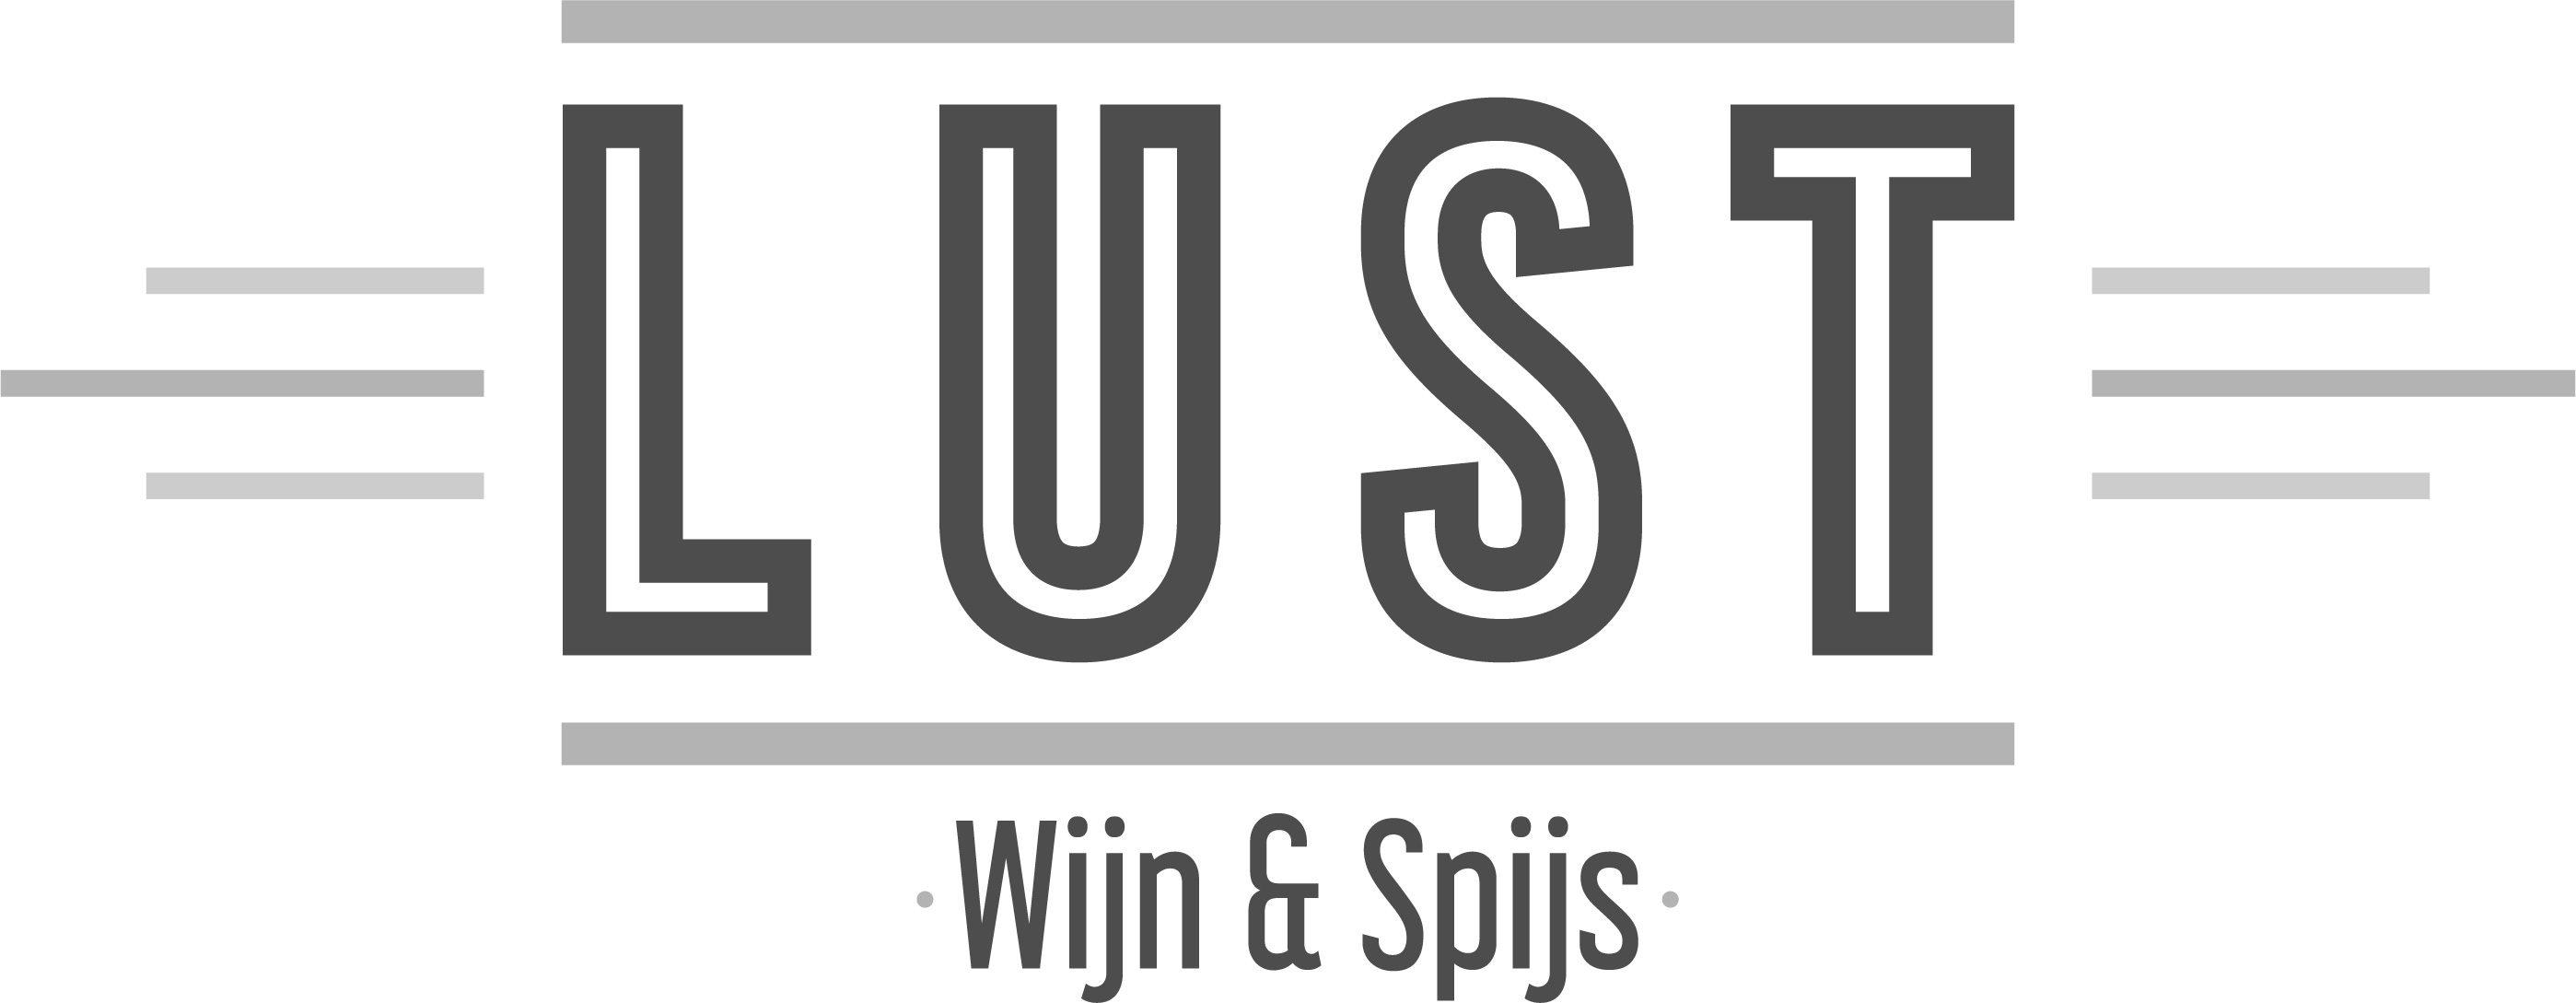 Lust Wijn & Spijs – Numansdorp